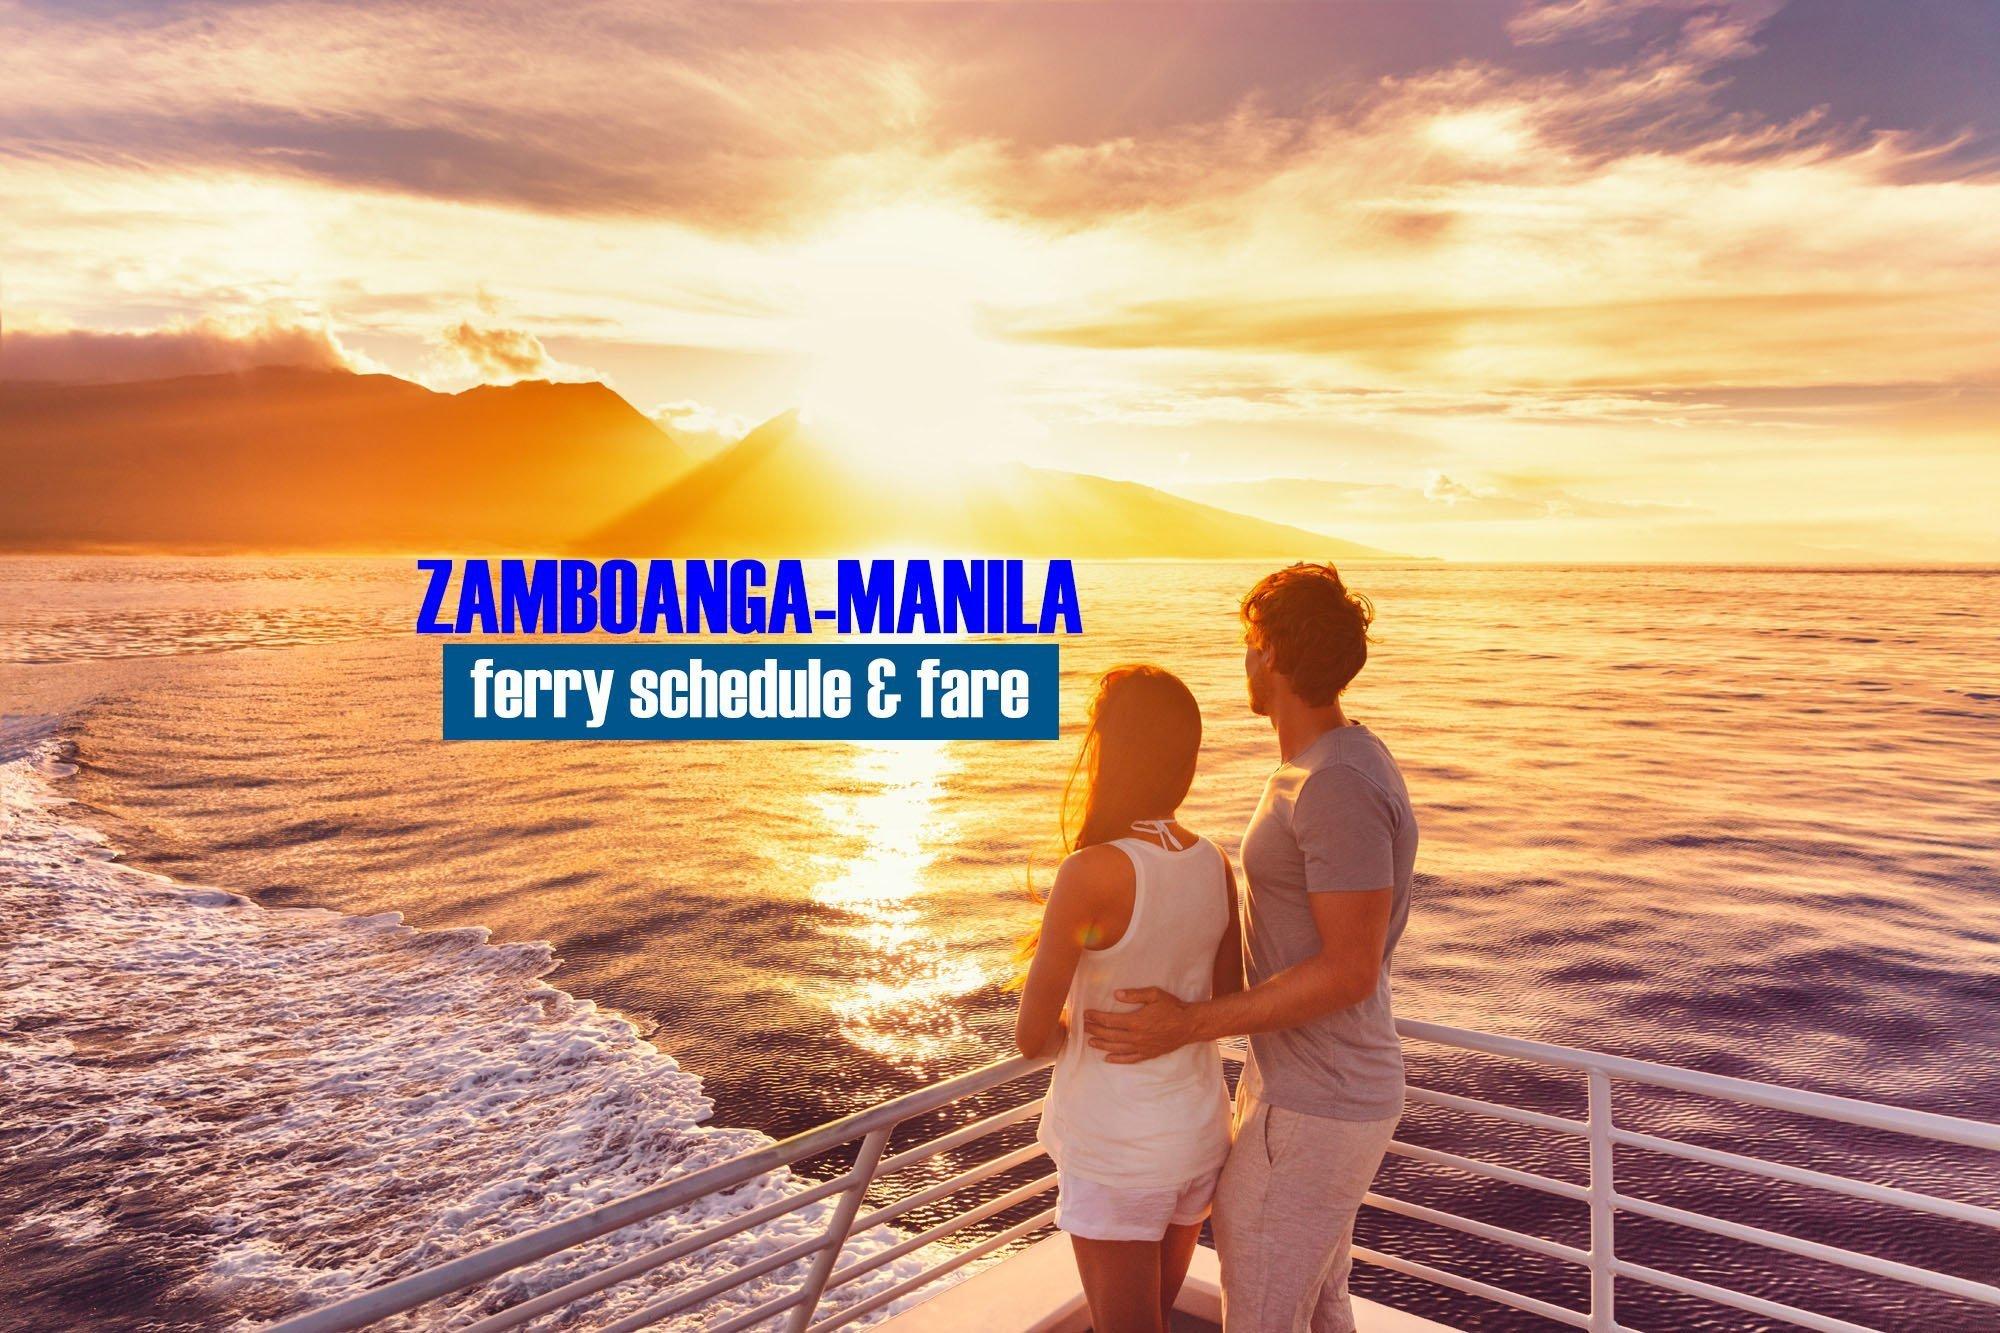 Zamboanga to Manila: 2019 Ferry Schedule & Fare